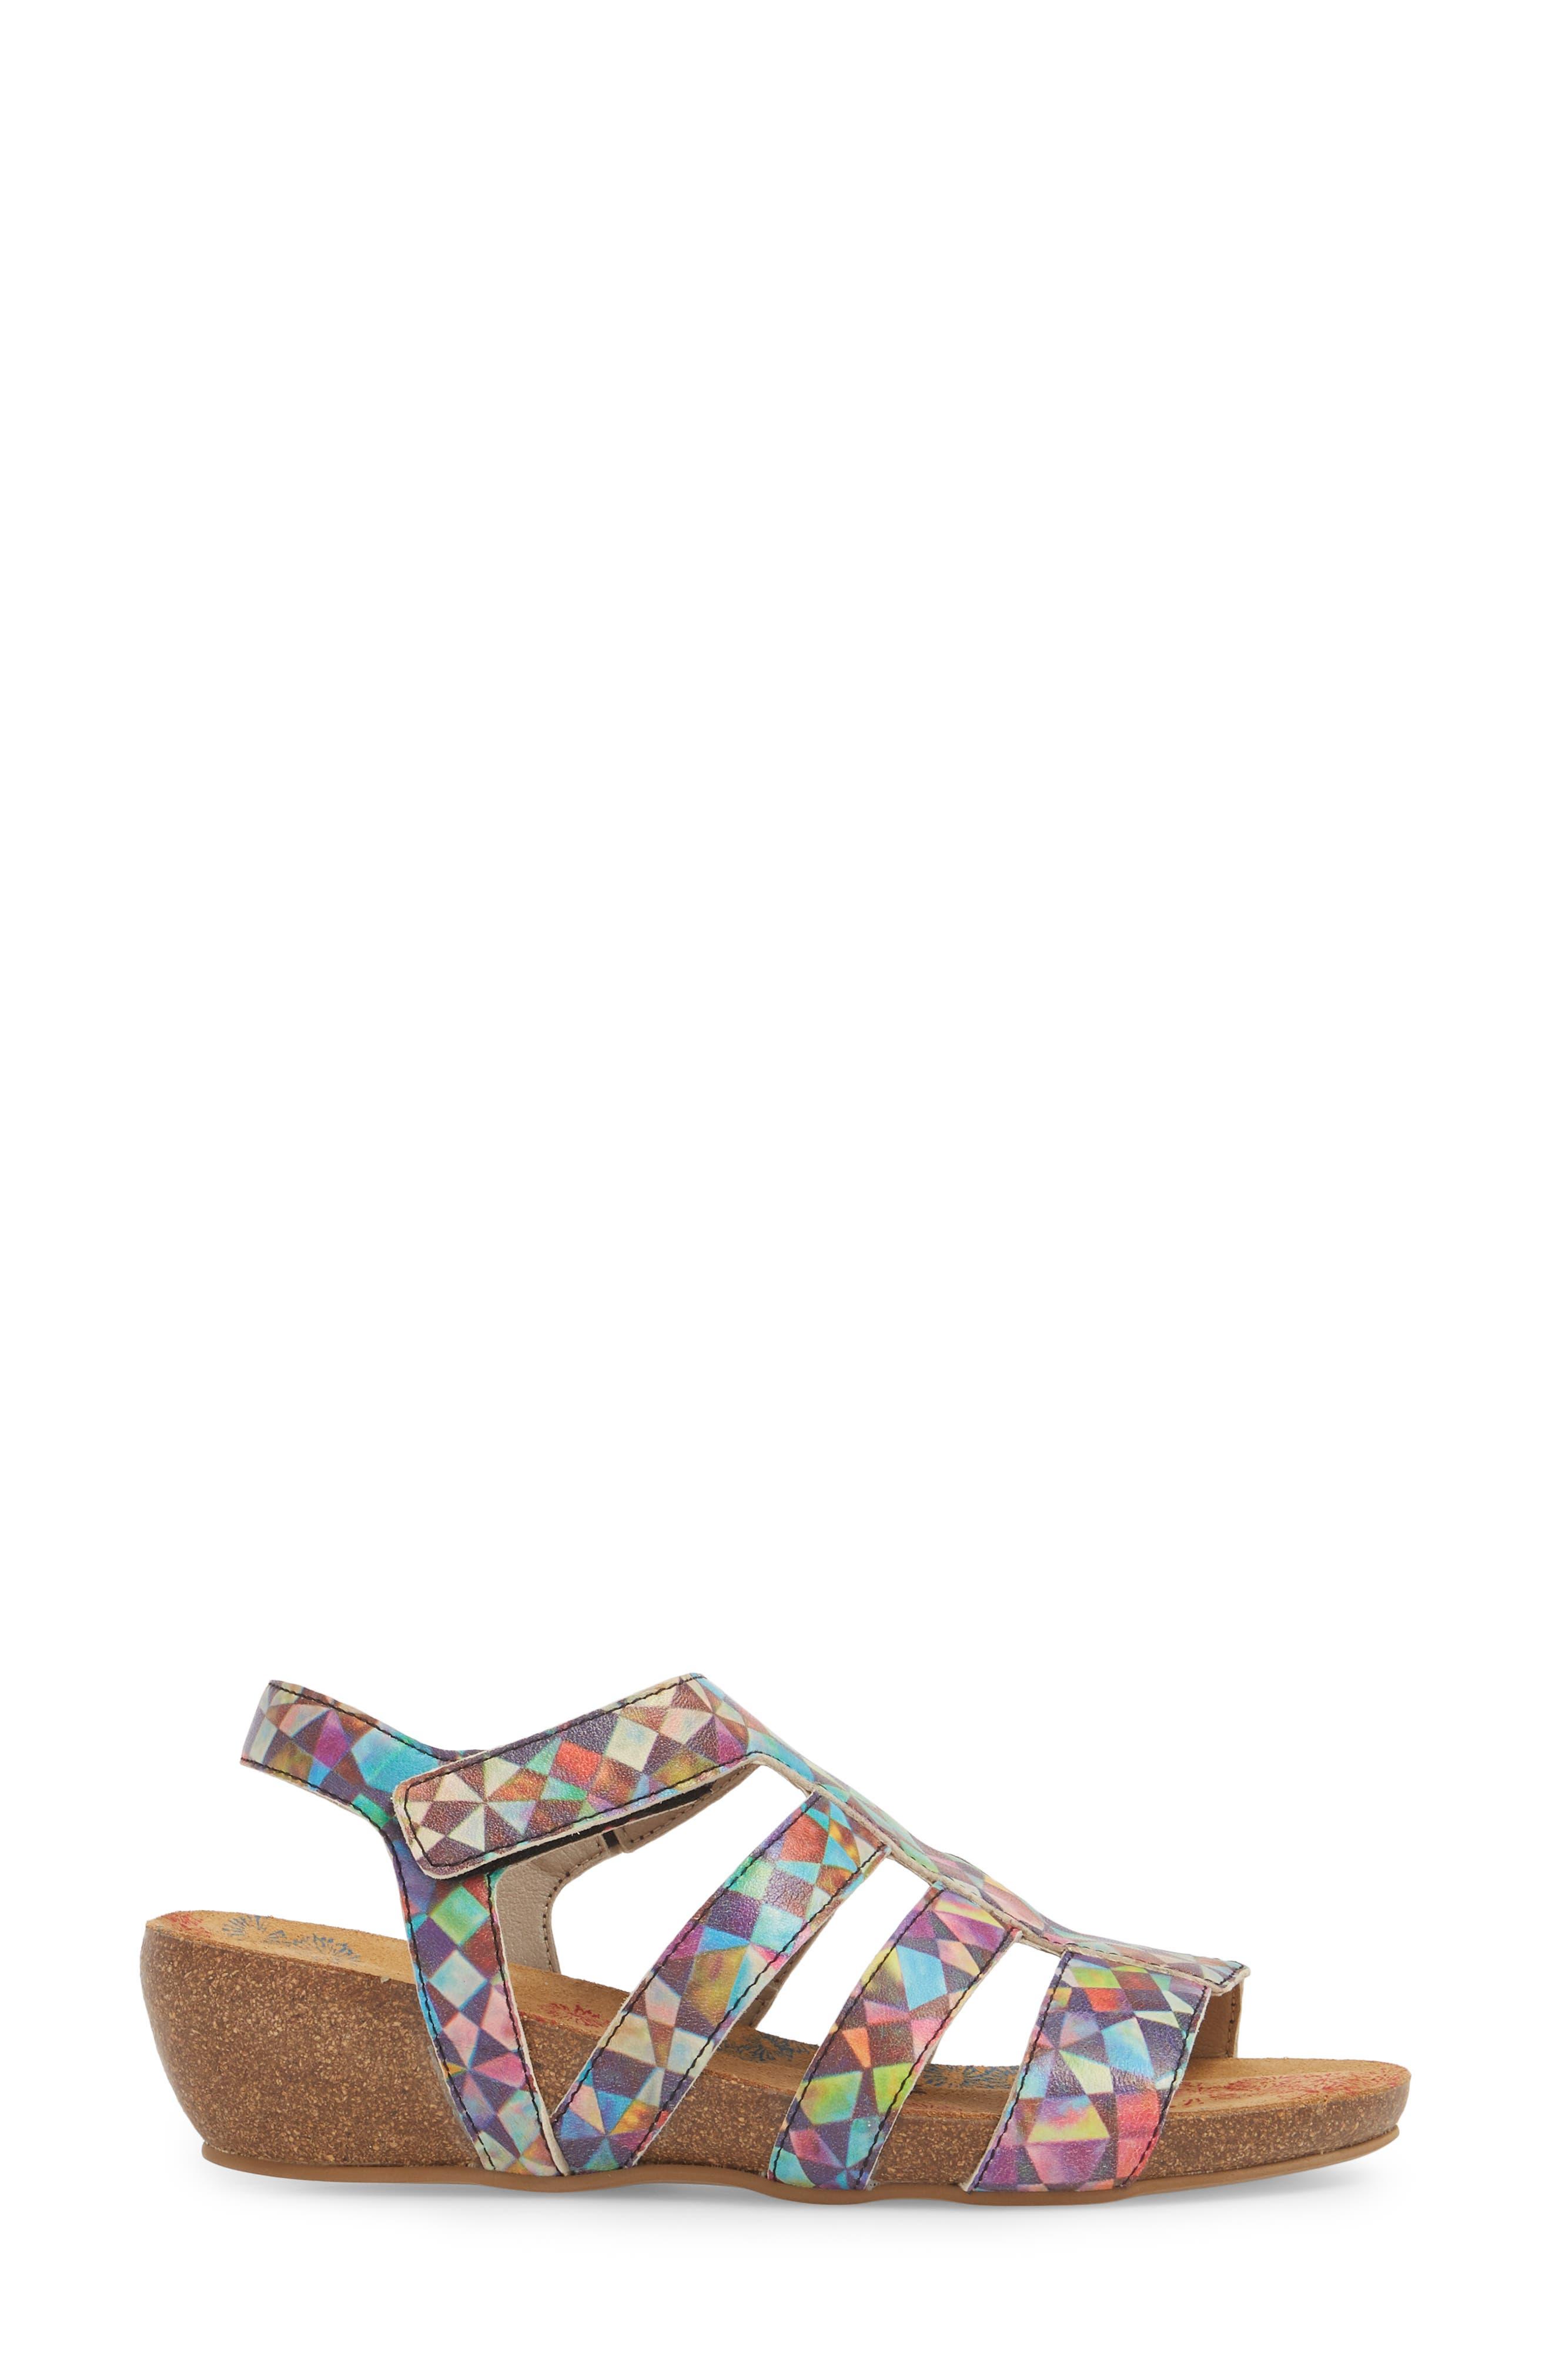 Delta Wedge Sandal,                             Alternate thumbnail 3, color,                             500